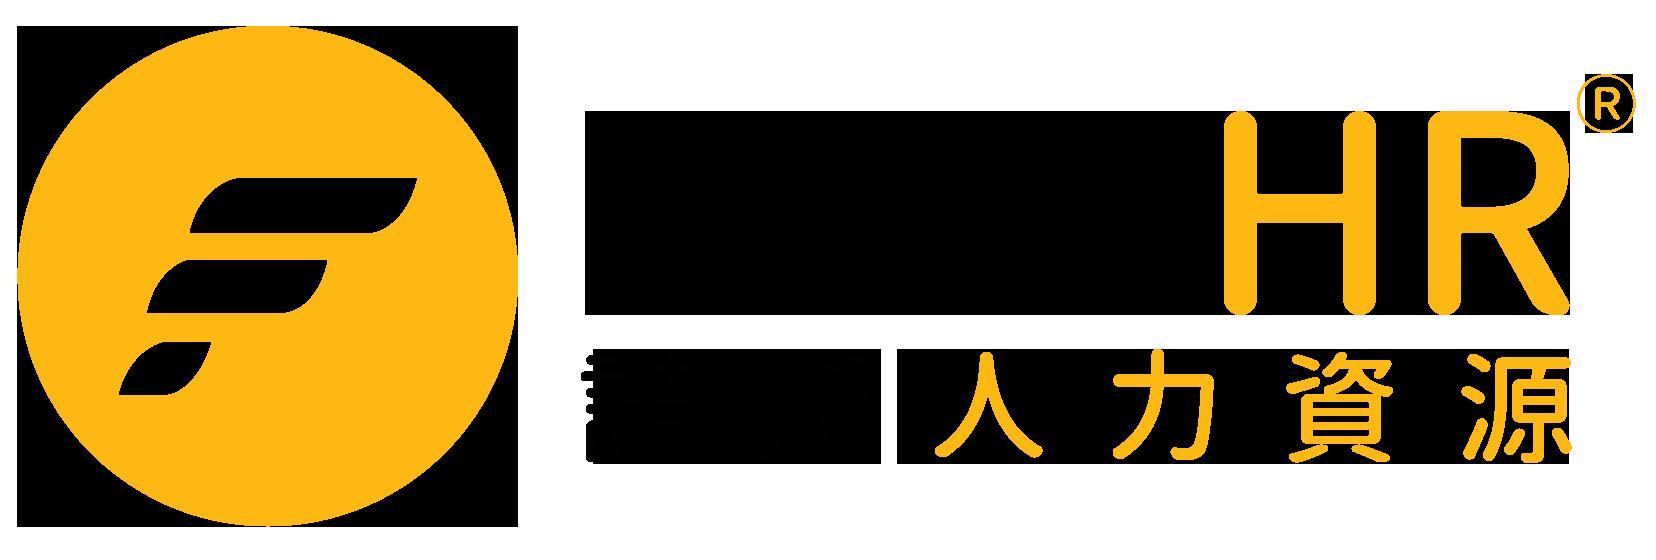 FLEXHR 諾斯人力資源